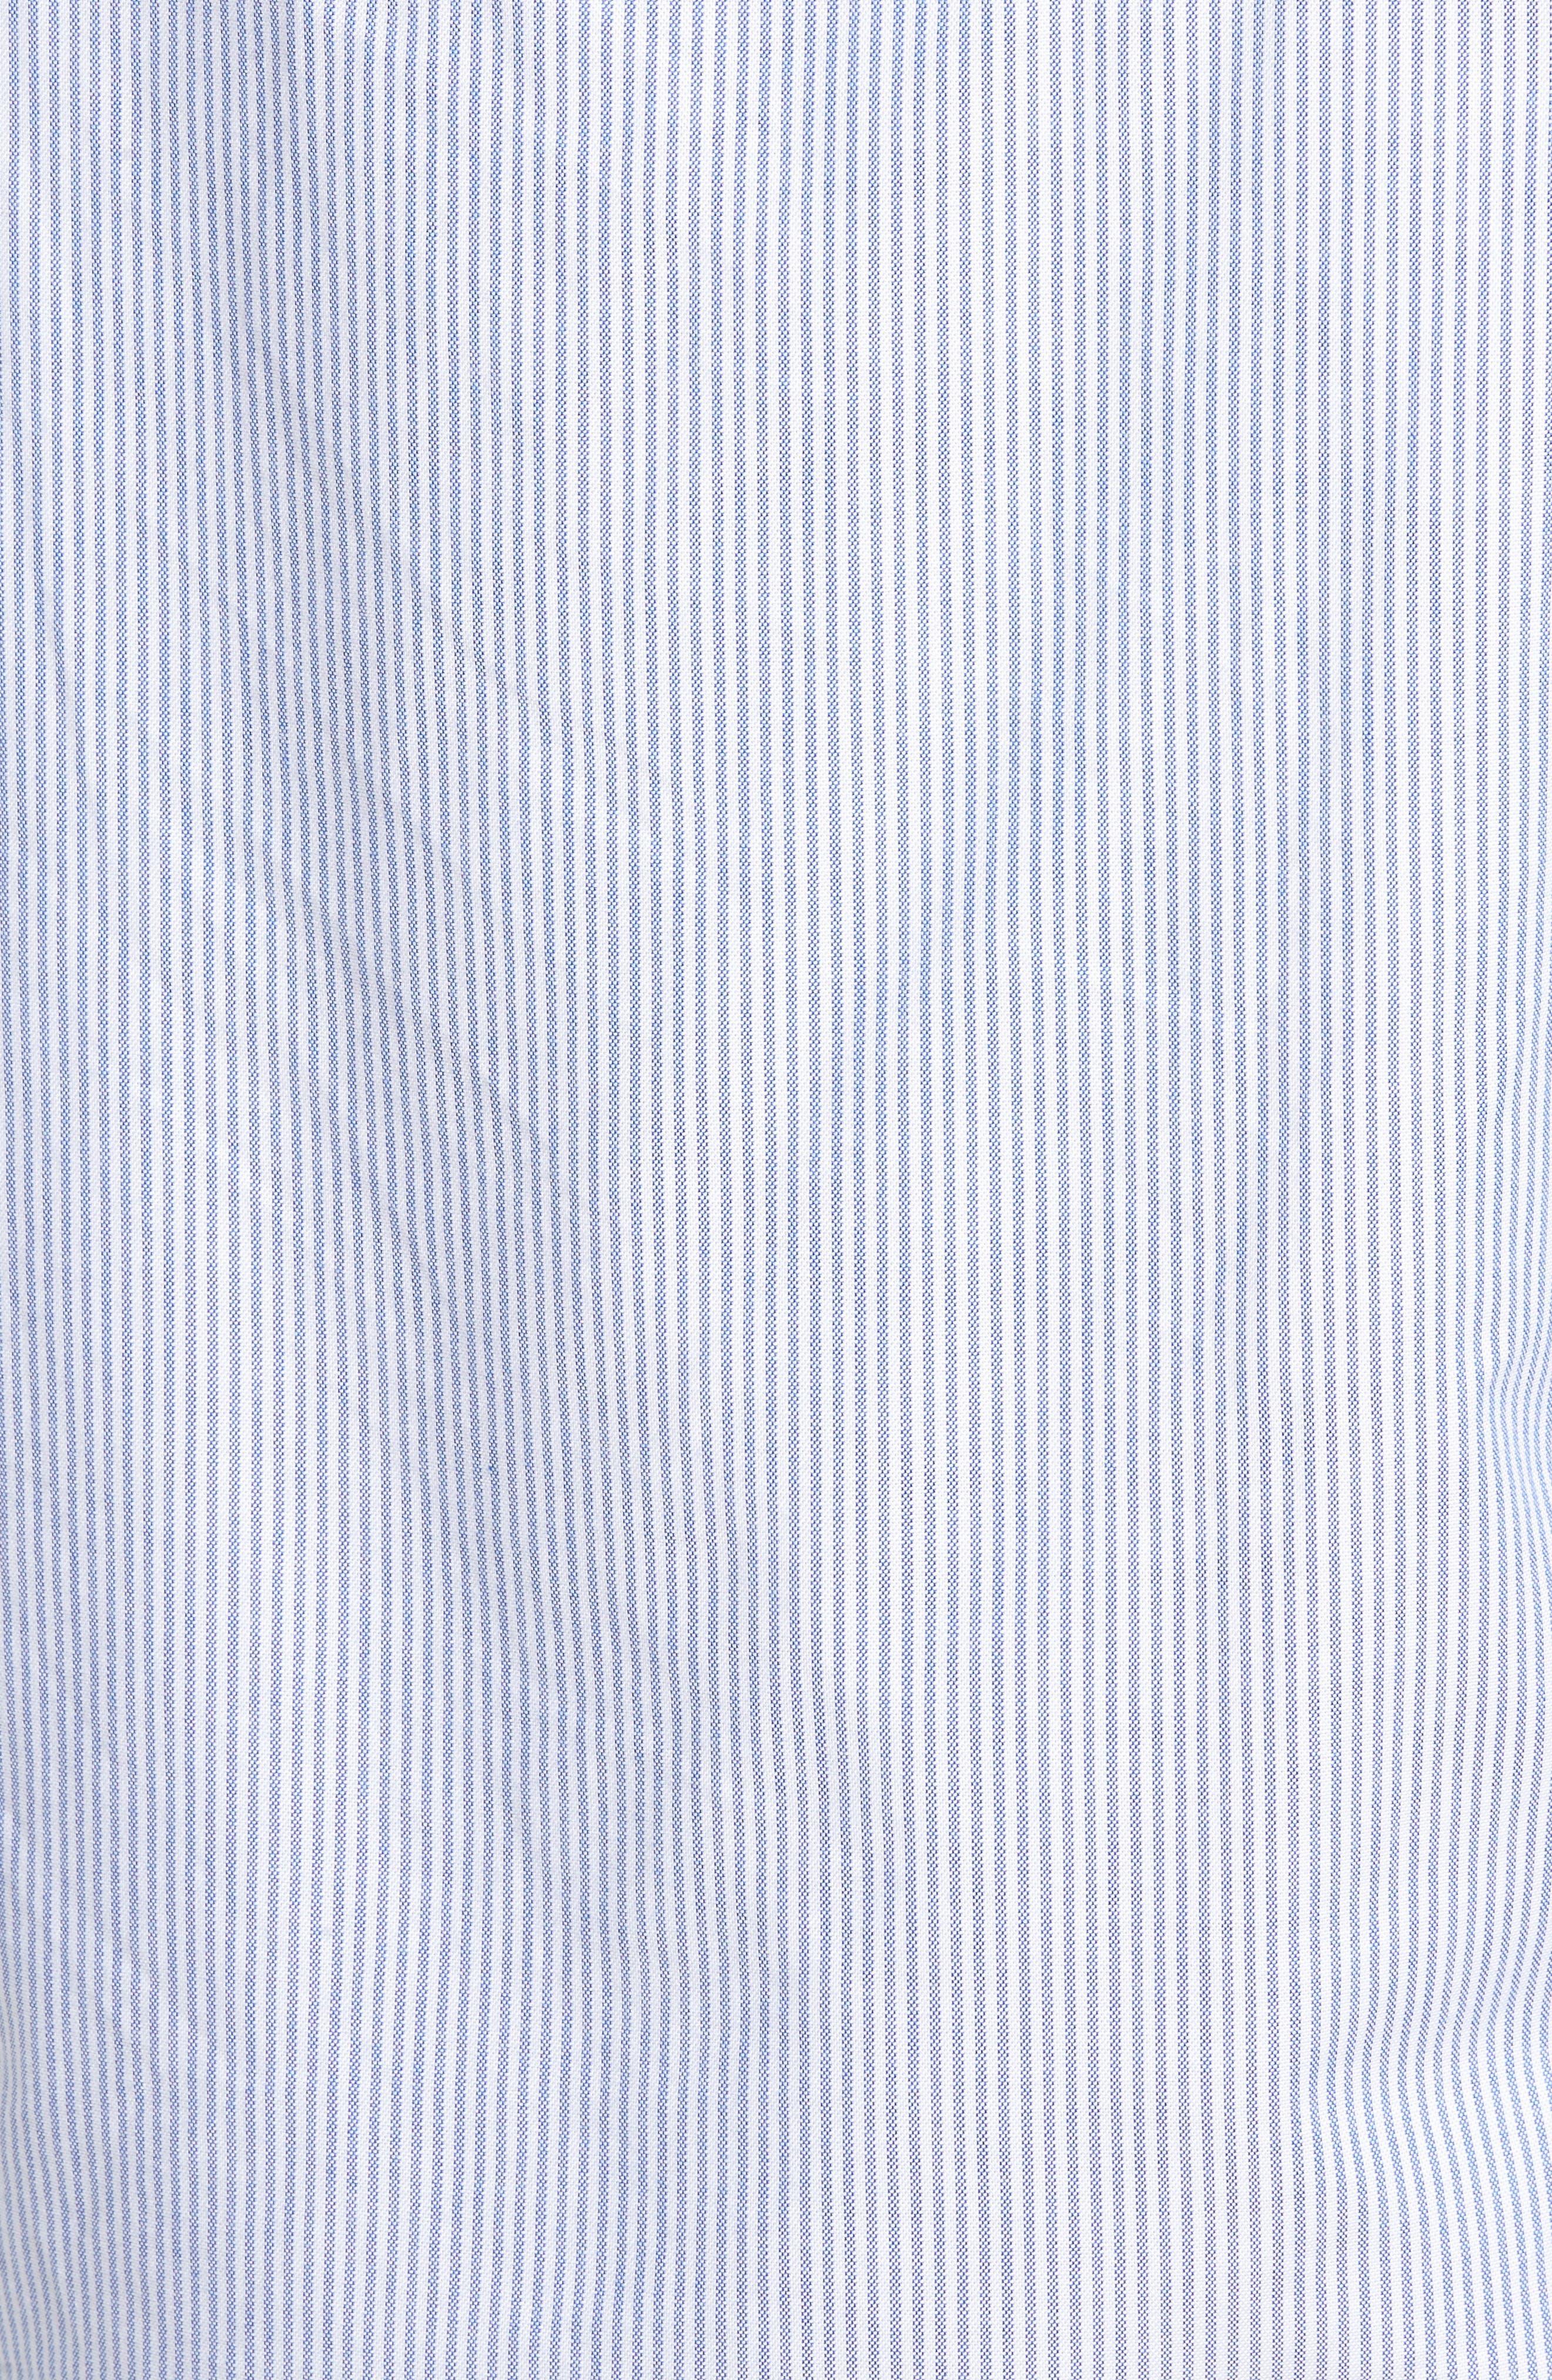 Slim Fit Stretch Stripe Pima Cotton Oxford Shirt,                             Alternate thumbnail 5, color,                             400